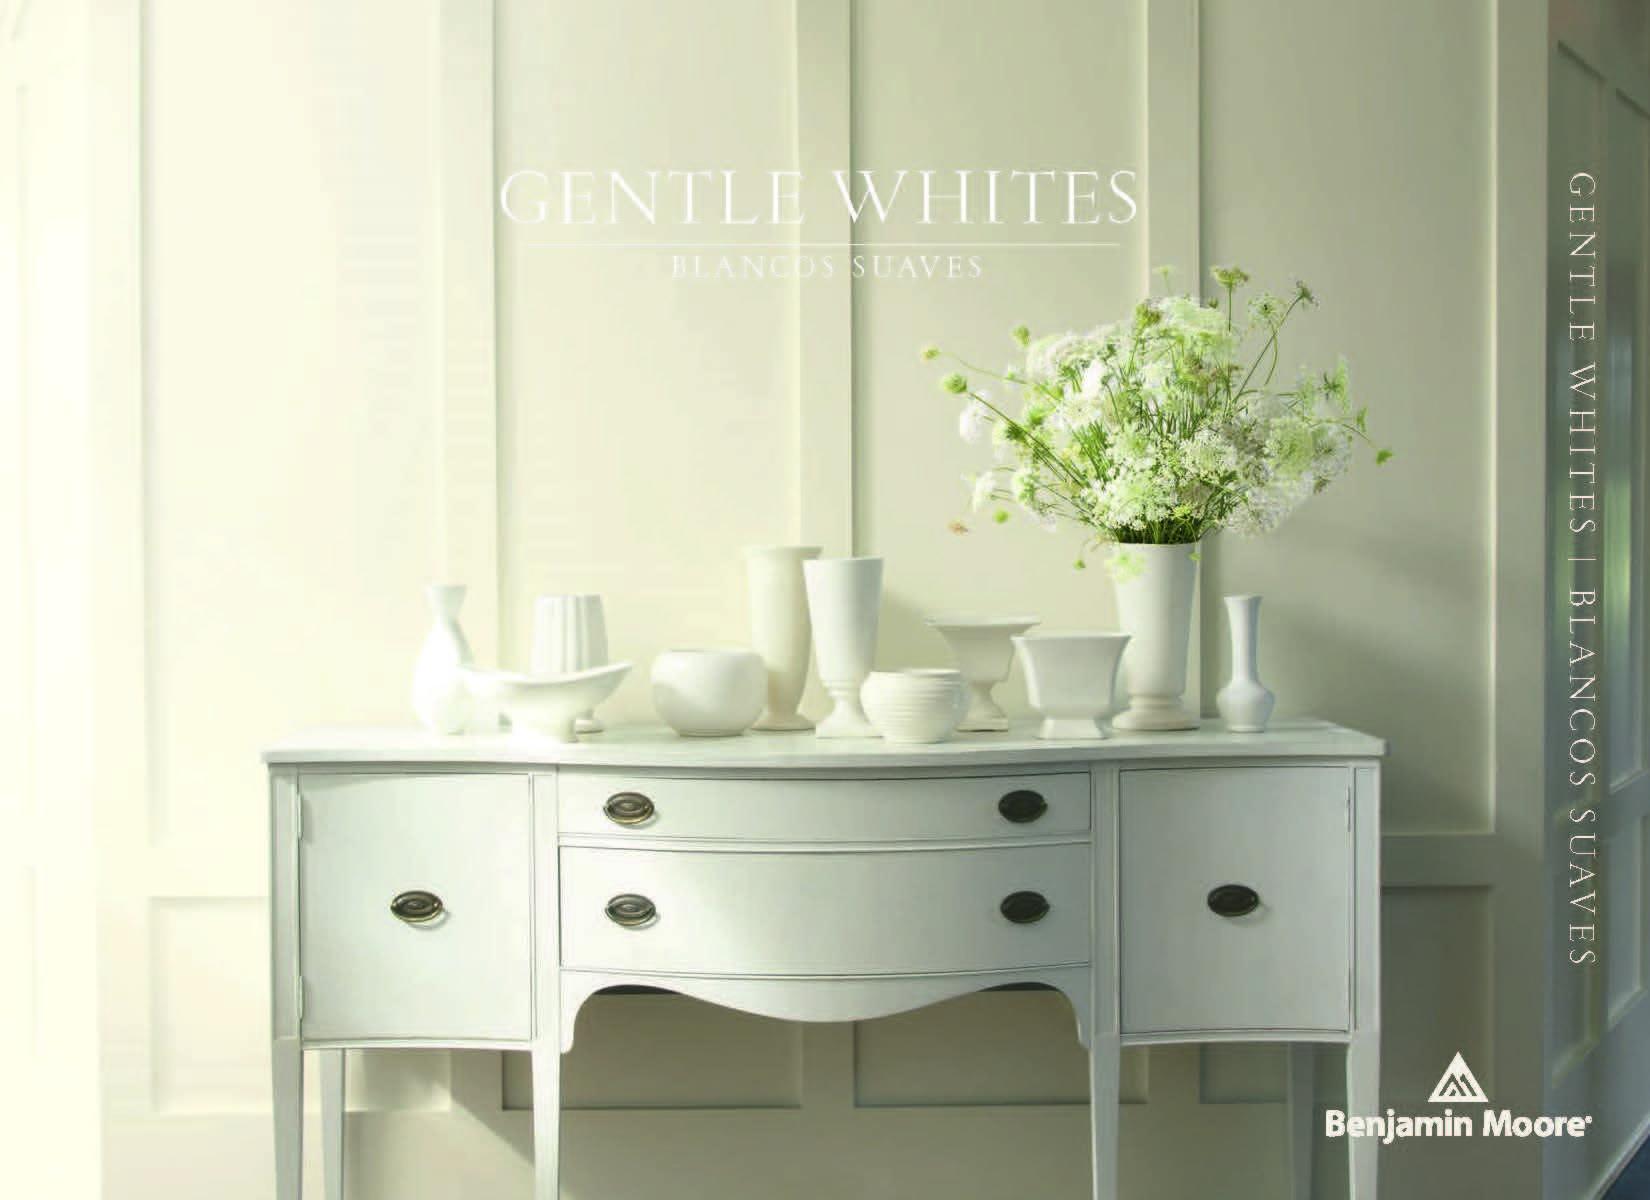 Benjamin Moore Catalog_Gentle Whites Cover